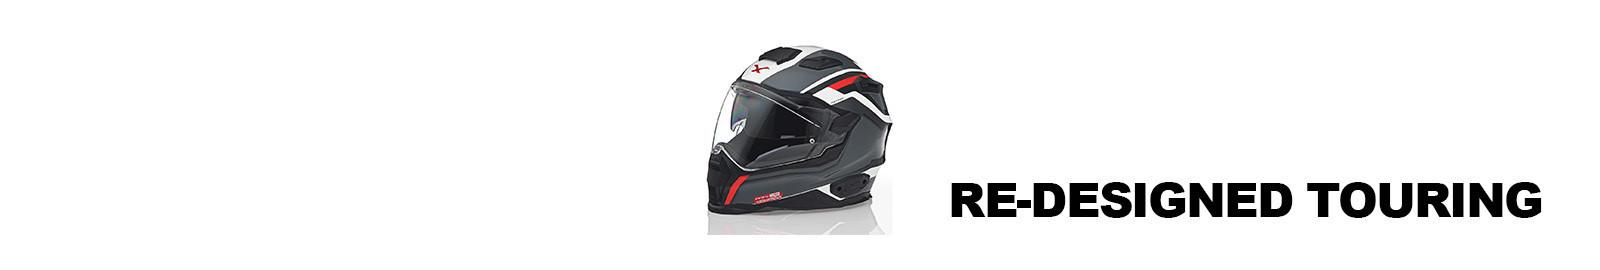 Nexx XWST Helmets